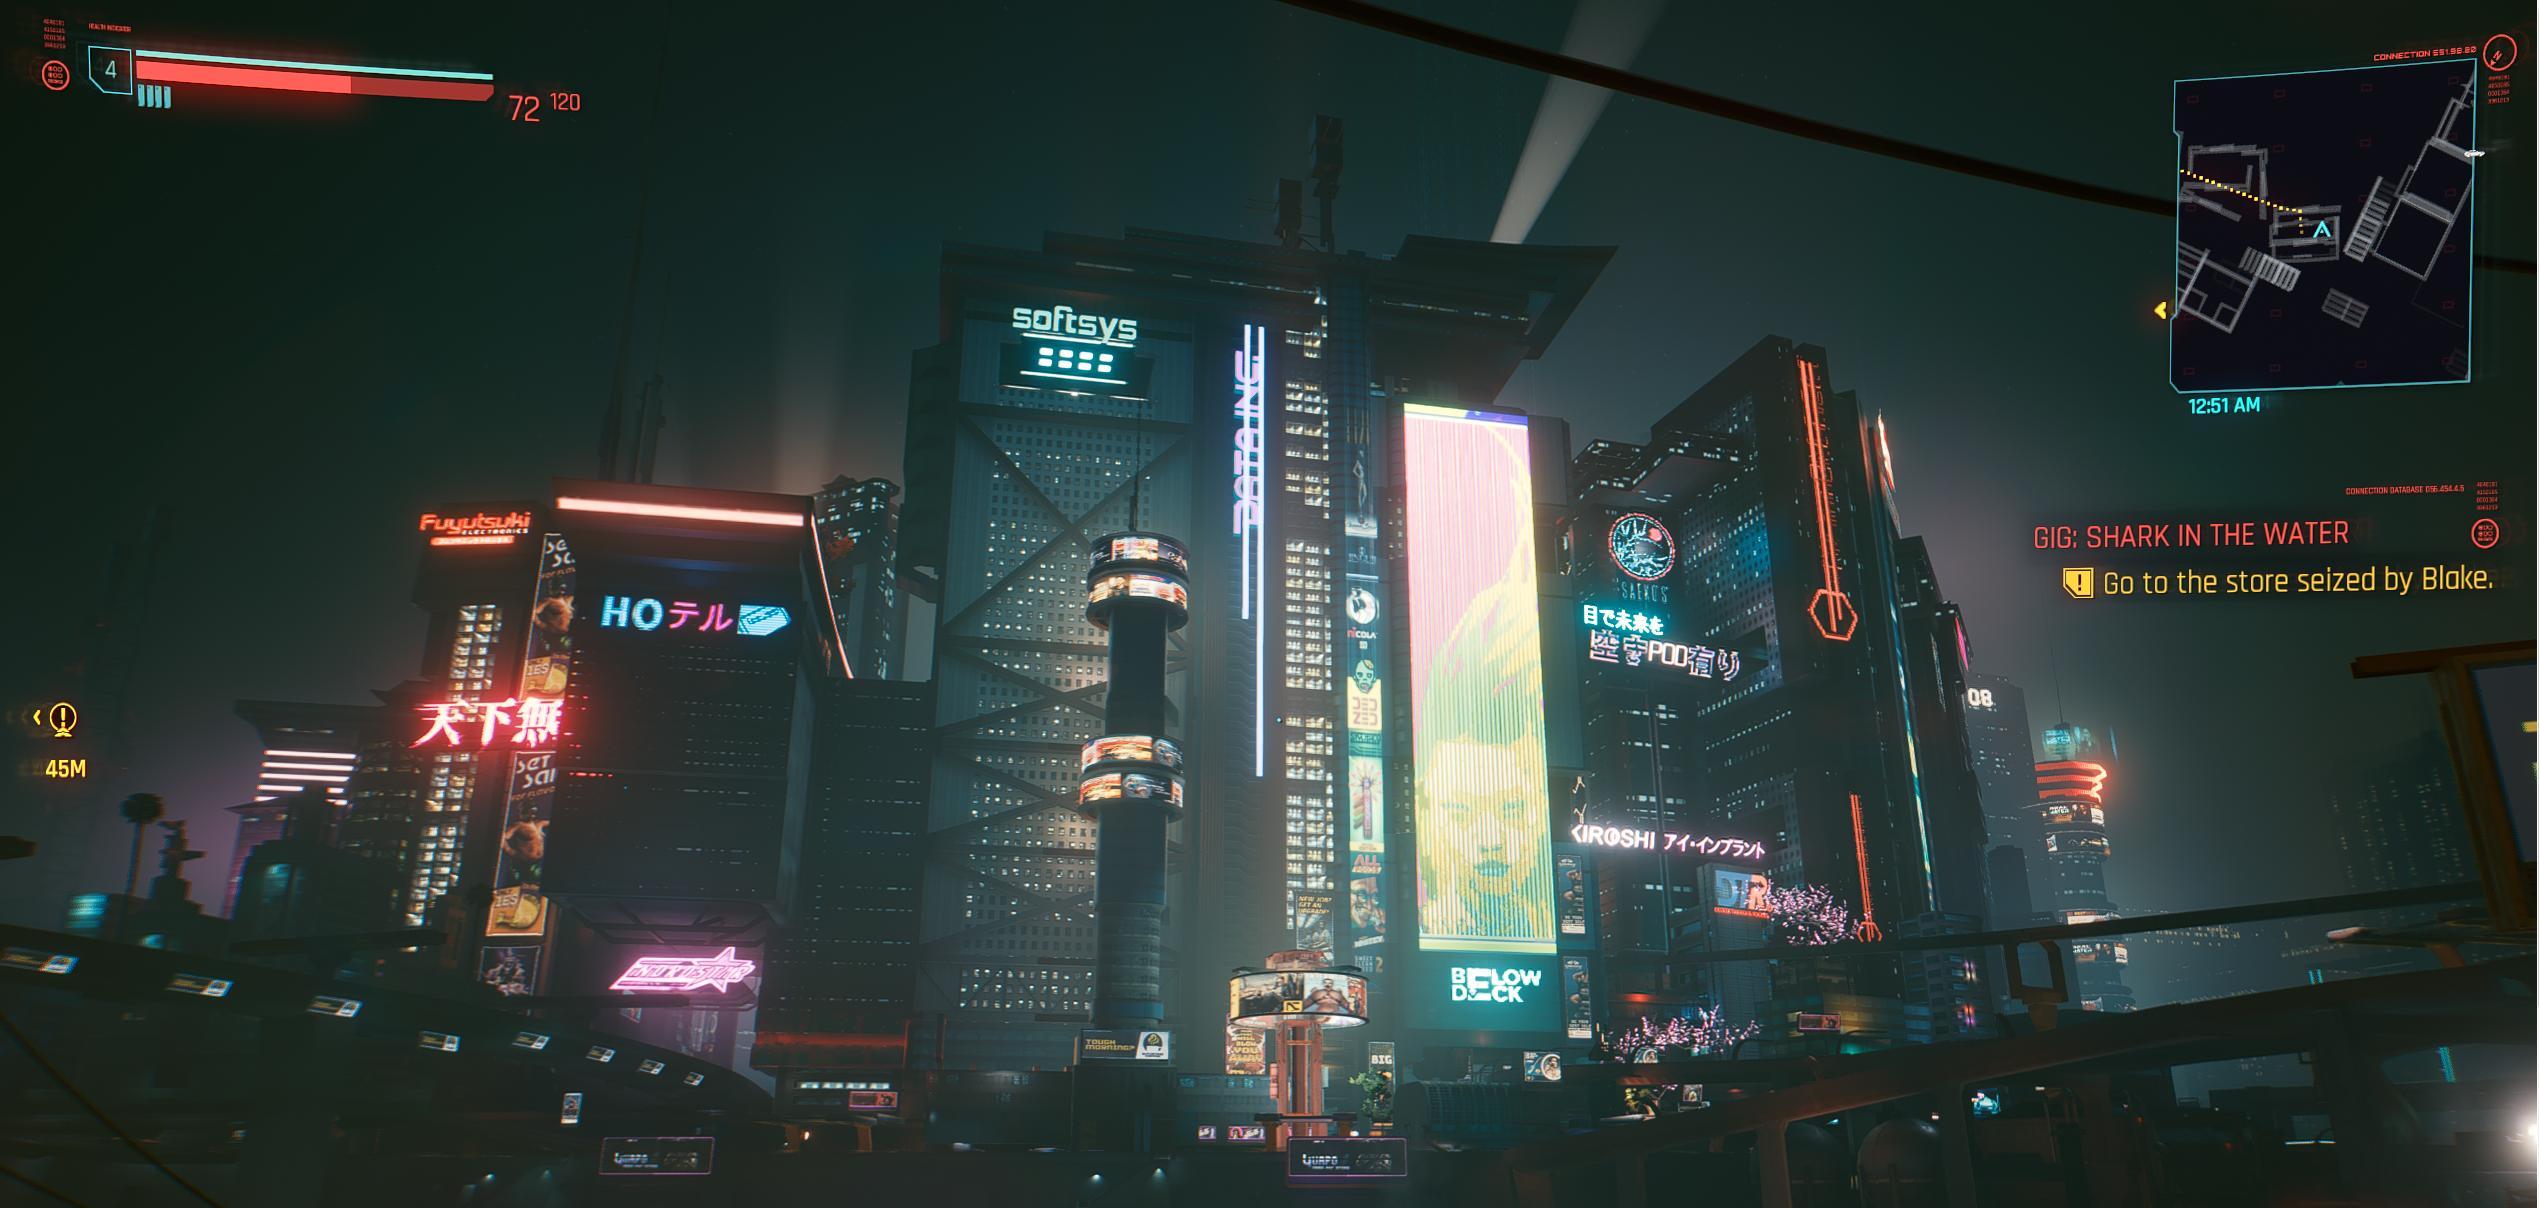 Как на Xbox улучшить качество картинки в Cyberpunk 2077